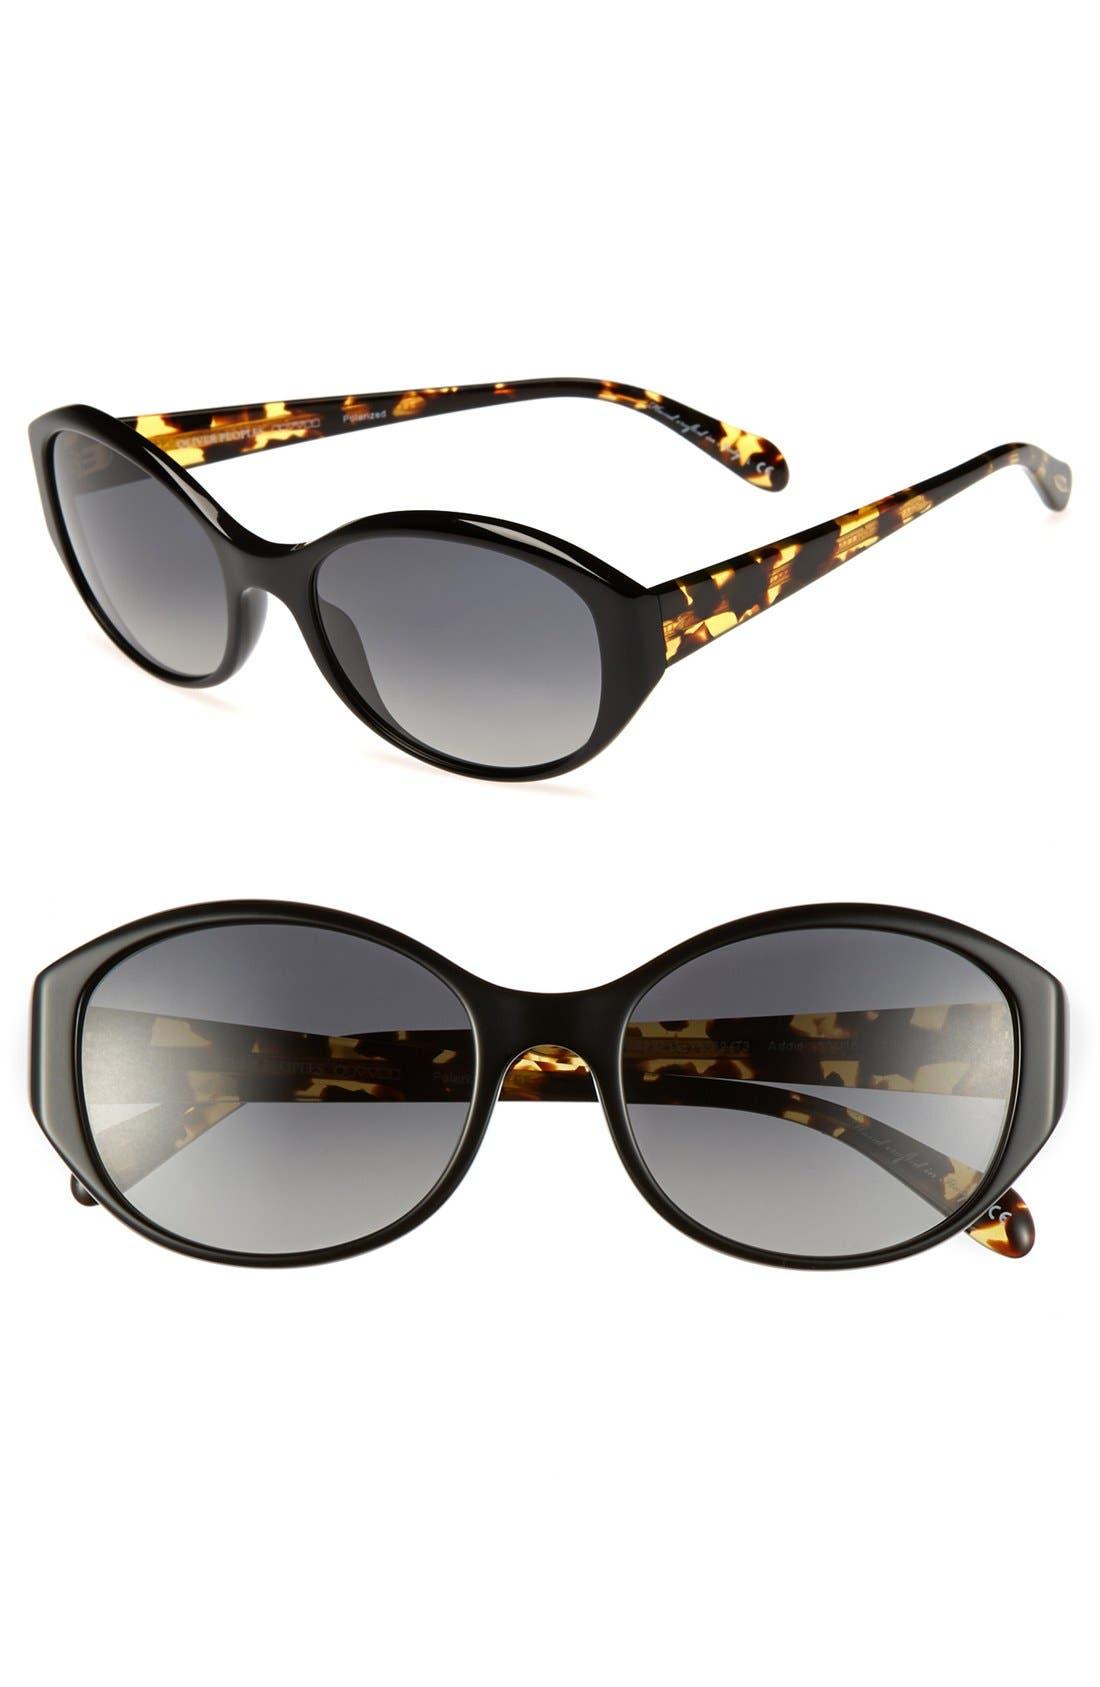 Alternate Image 1 Selected - Oliver Peoples 'Addie' 55mm Sunglasses